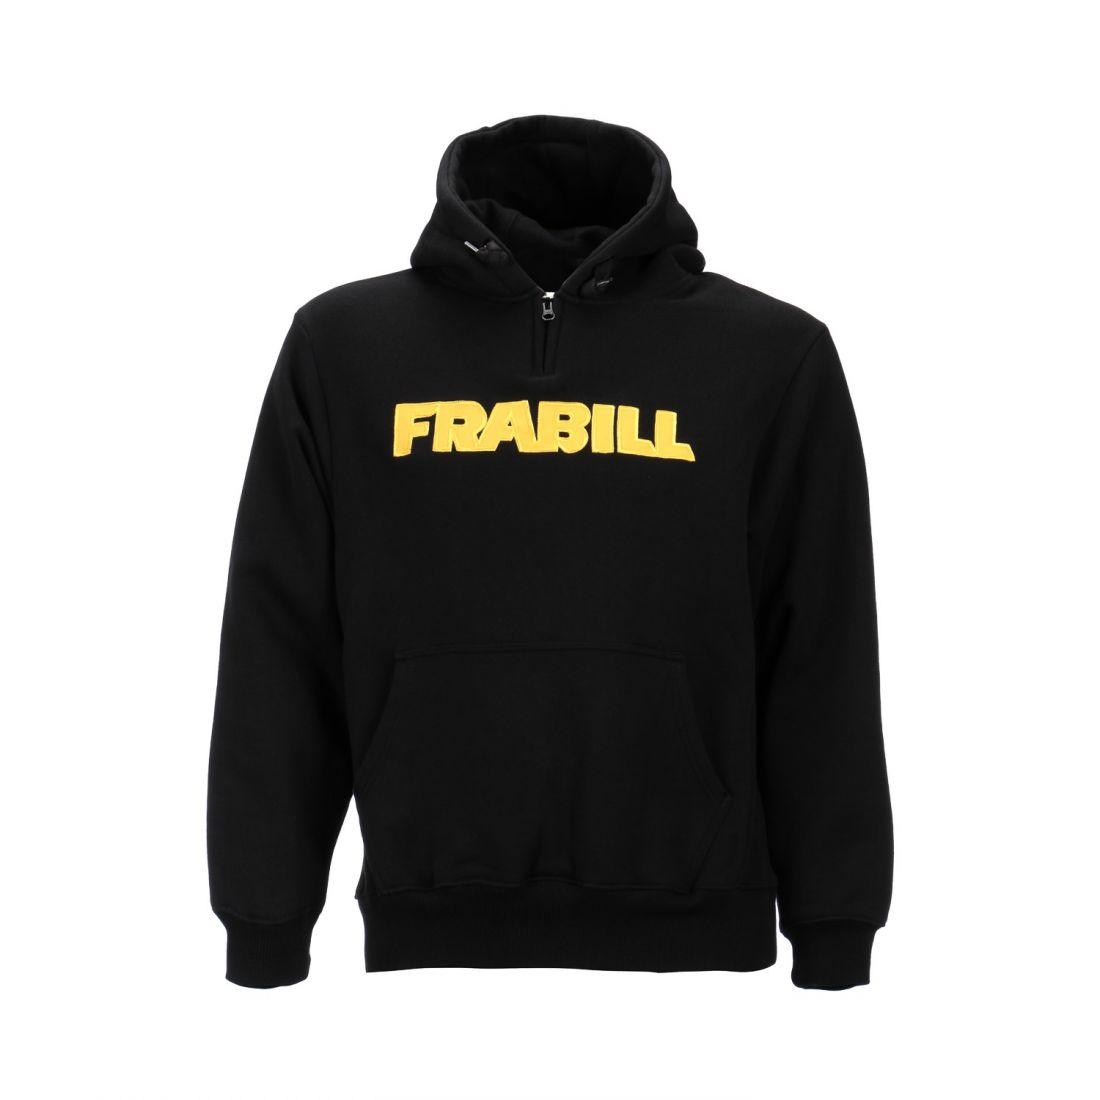 Кенгурушка Frabill Heavyweight Cotton Hooded Sweatshirt черная размер XL